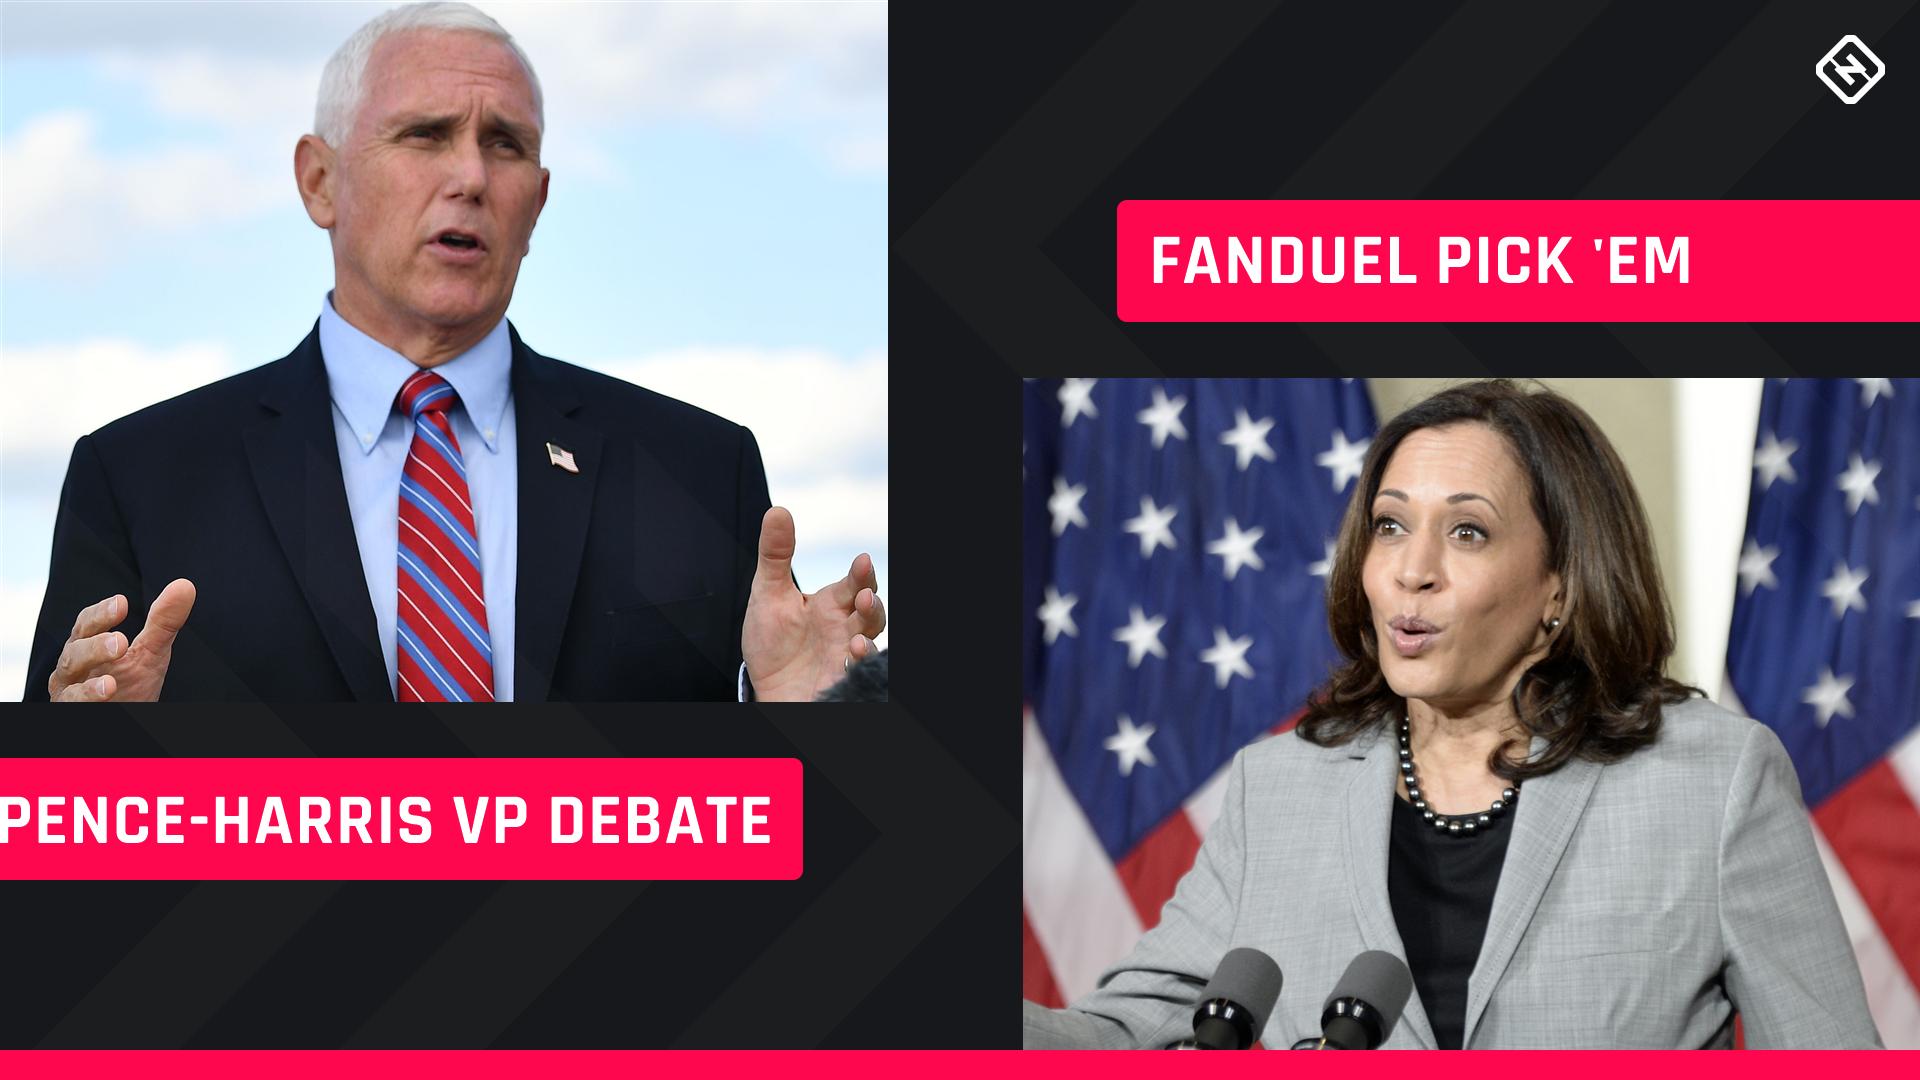 FanDuel Presidential Pick 'em: Prop bet-style picks for Pence-Harris vice presidential debate 1